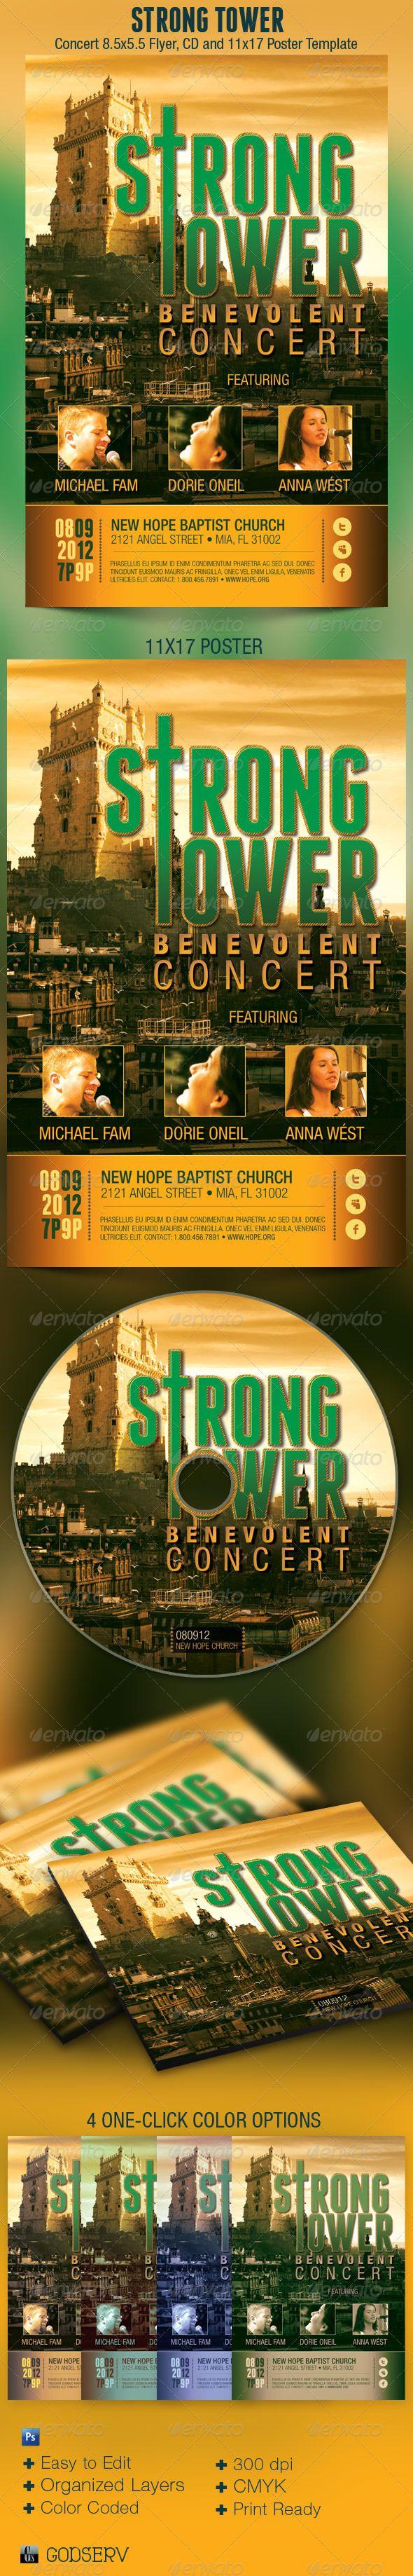 Strong Tower Church Flyer Poster CD Template | Concert flyer